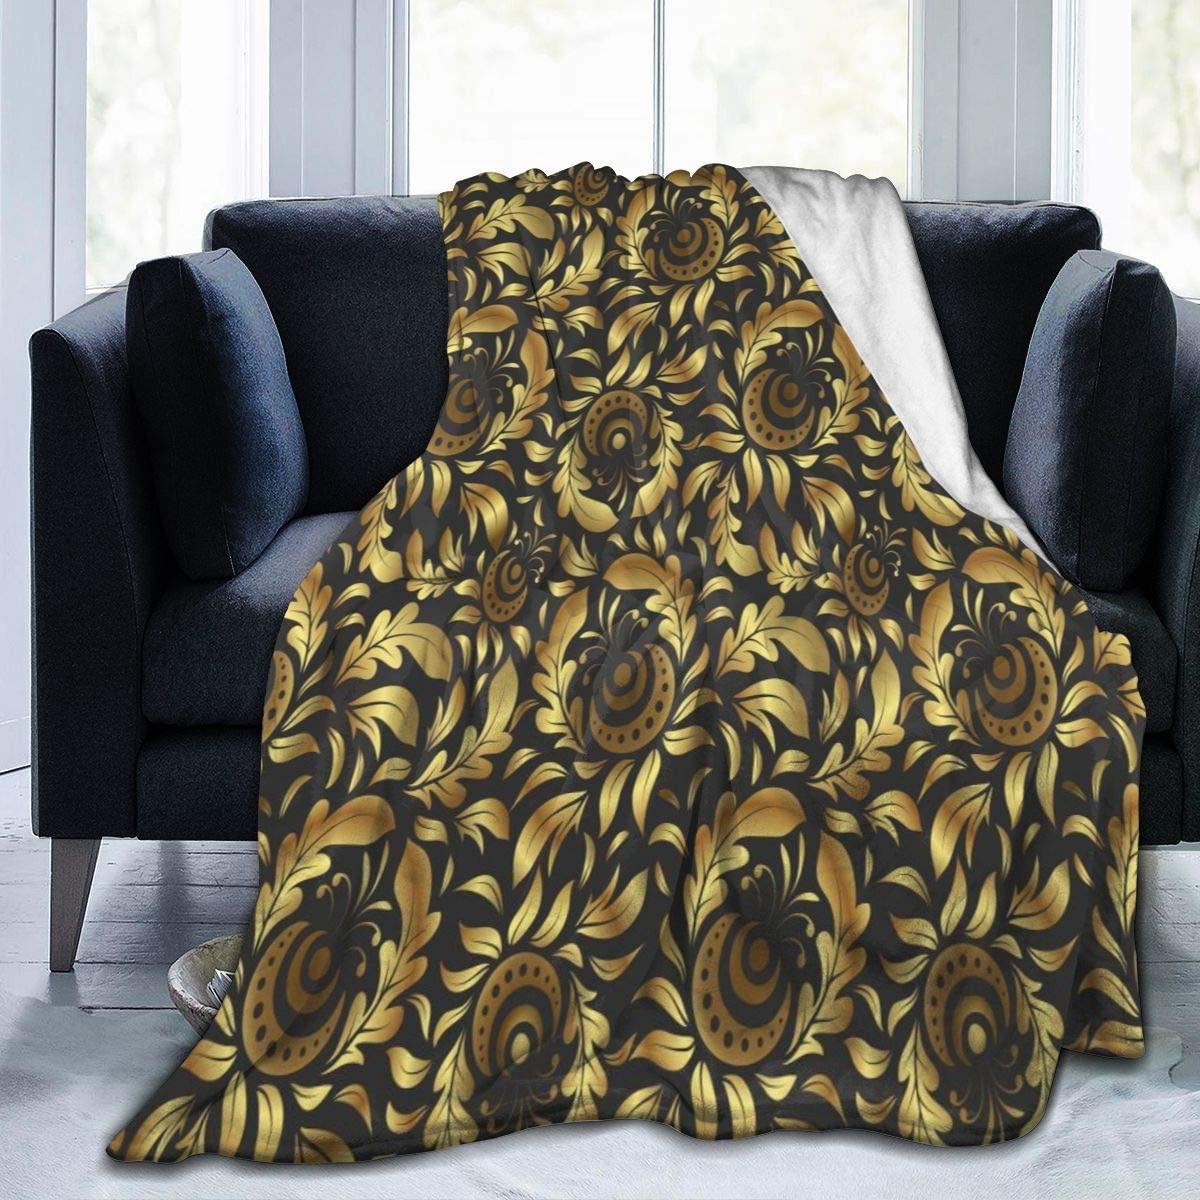 Micro Fleece Plush Soft Baby Blanket Golden Flower Floral Fluffy Warm Toddler Bed/Crib Blanket Lightweight Flannel Daycare Nap Kids Sleeping Tummy Time Throw Blanket Girls Boy Clearance Kid/Baby